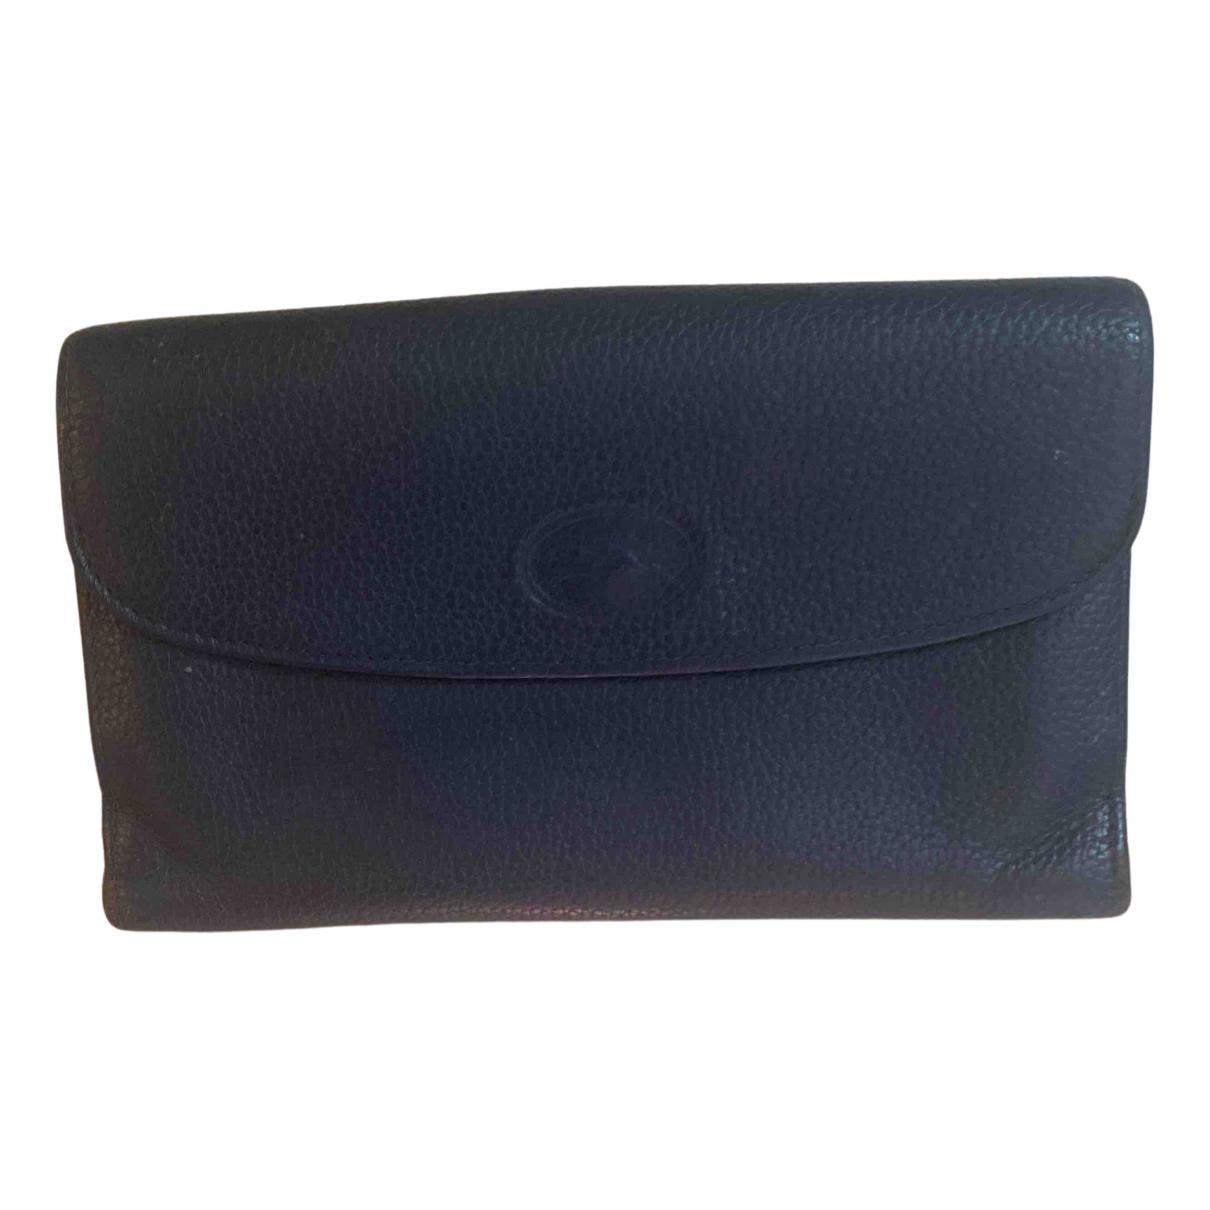 Longchamp \N Navy Leather wallet for Women \N